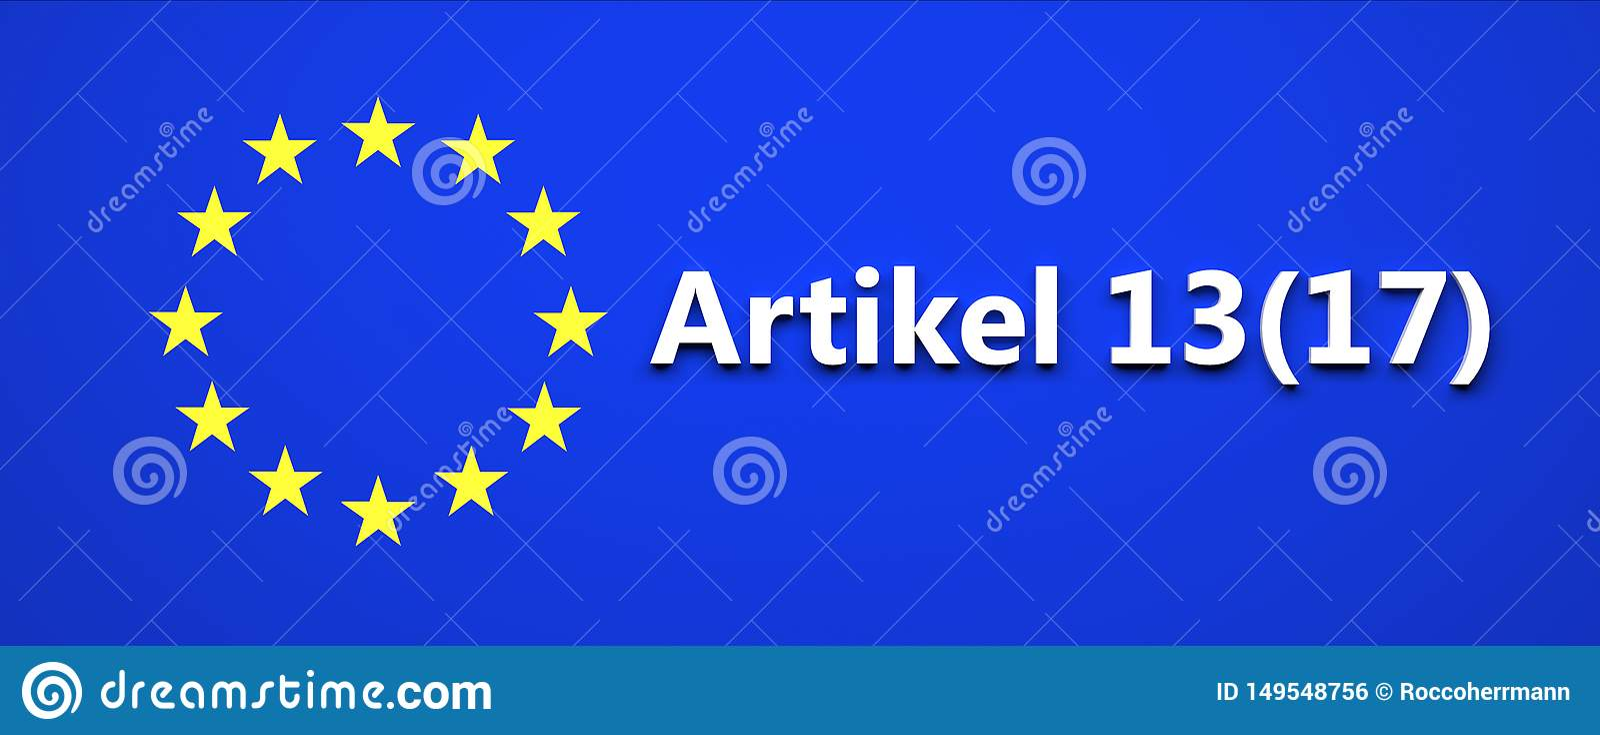 European union law decision - illustration